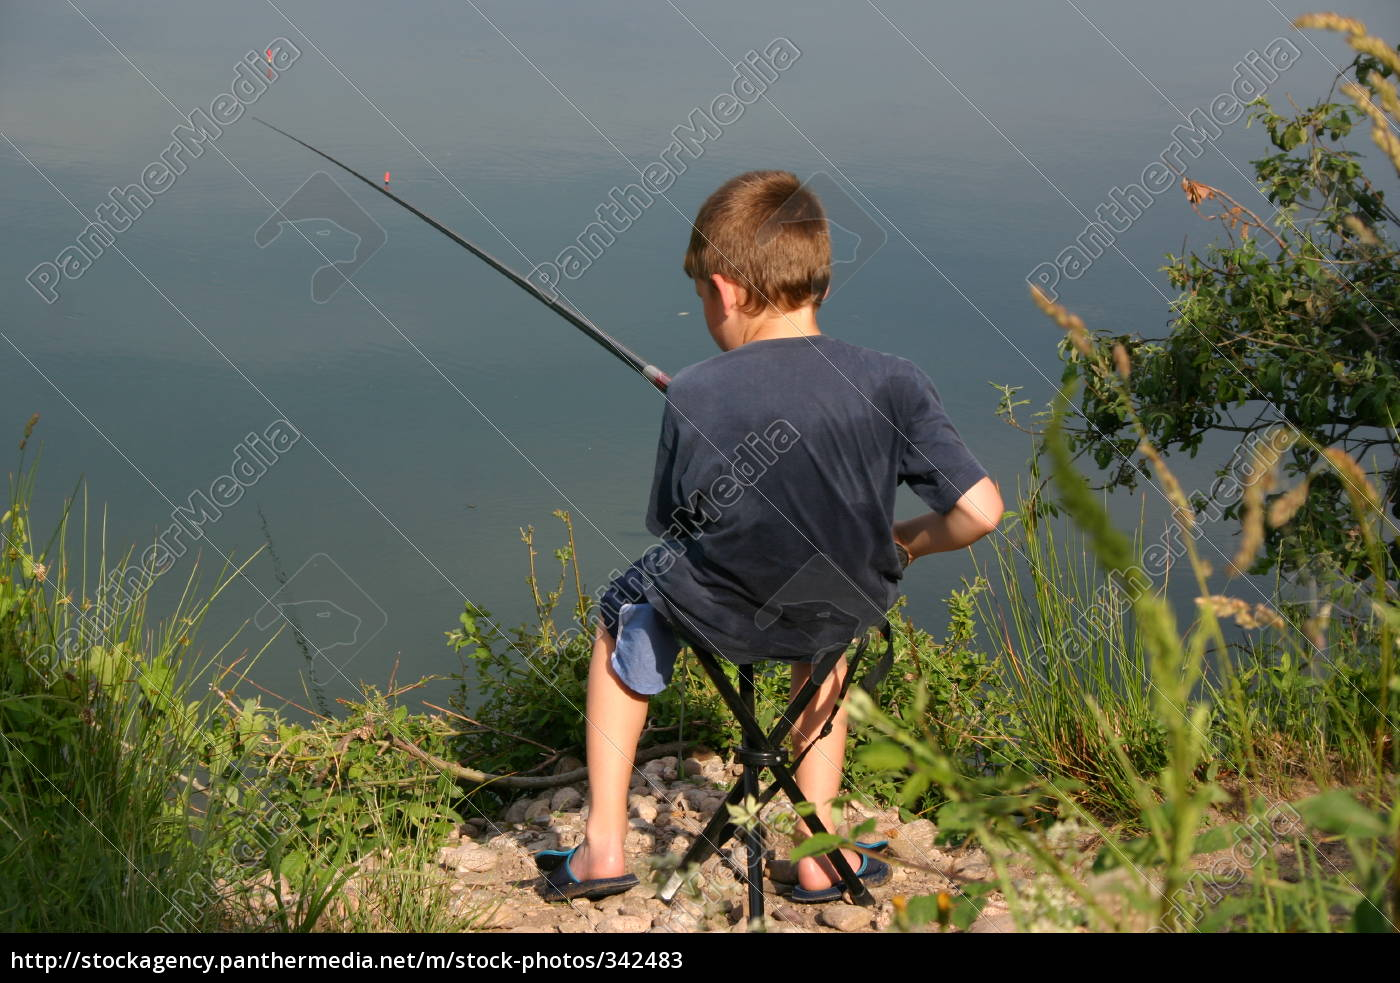 child, fishing - 342483